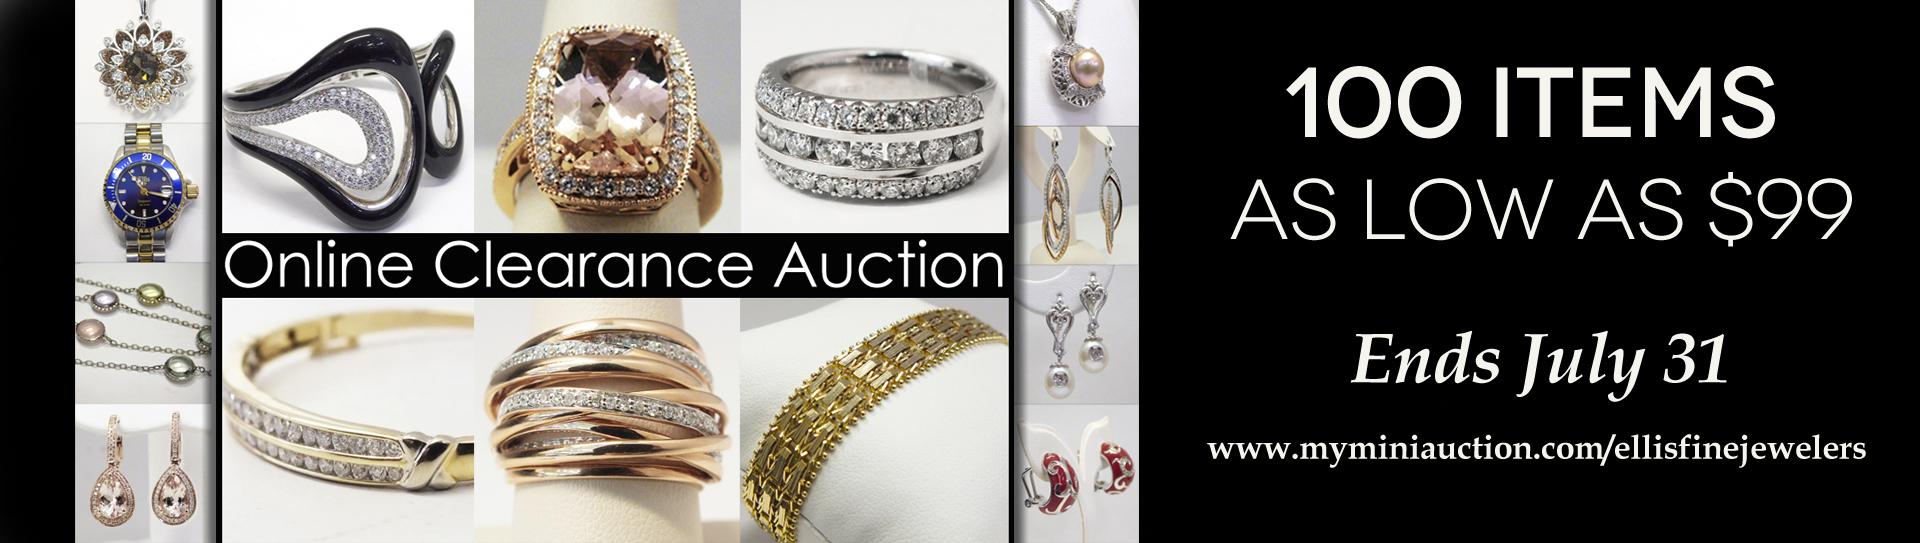 Clearance Auction